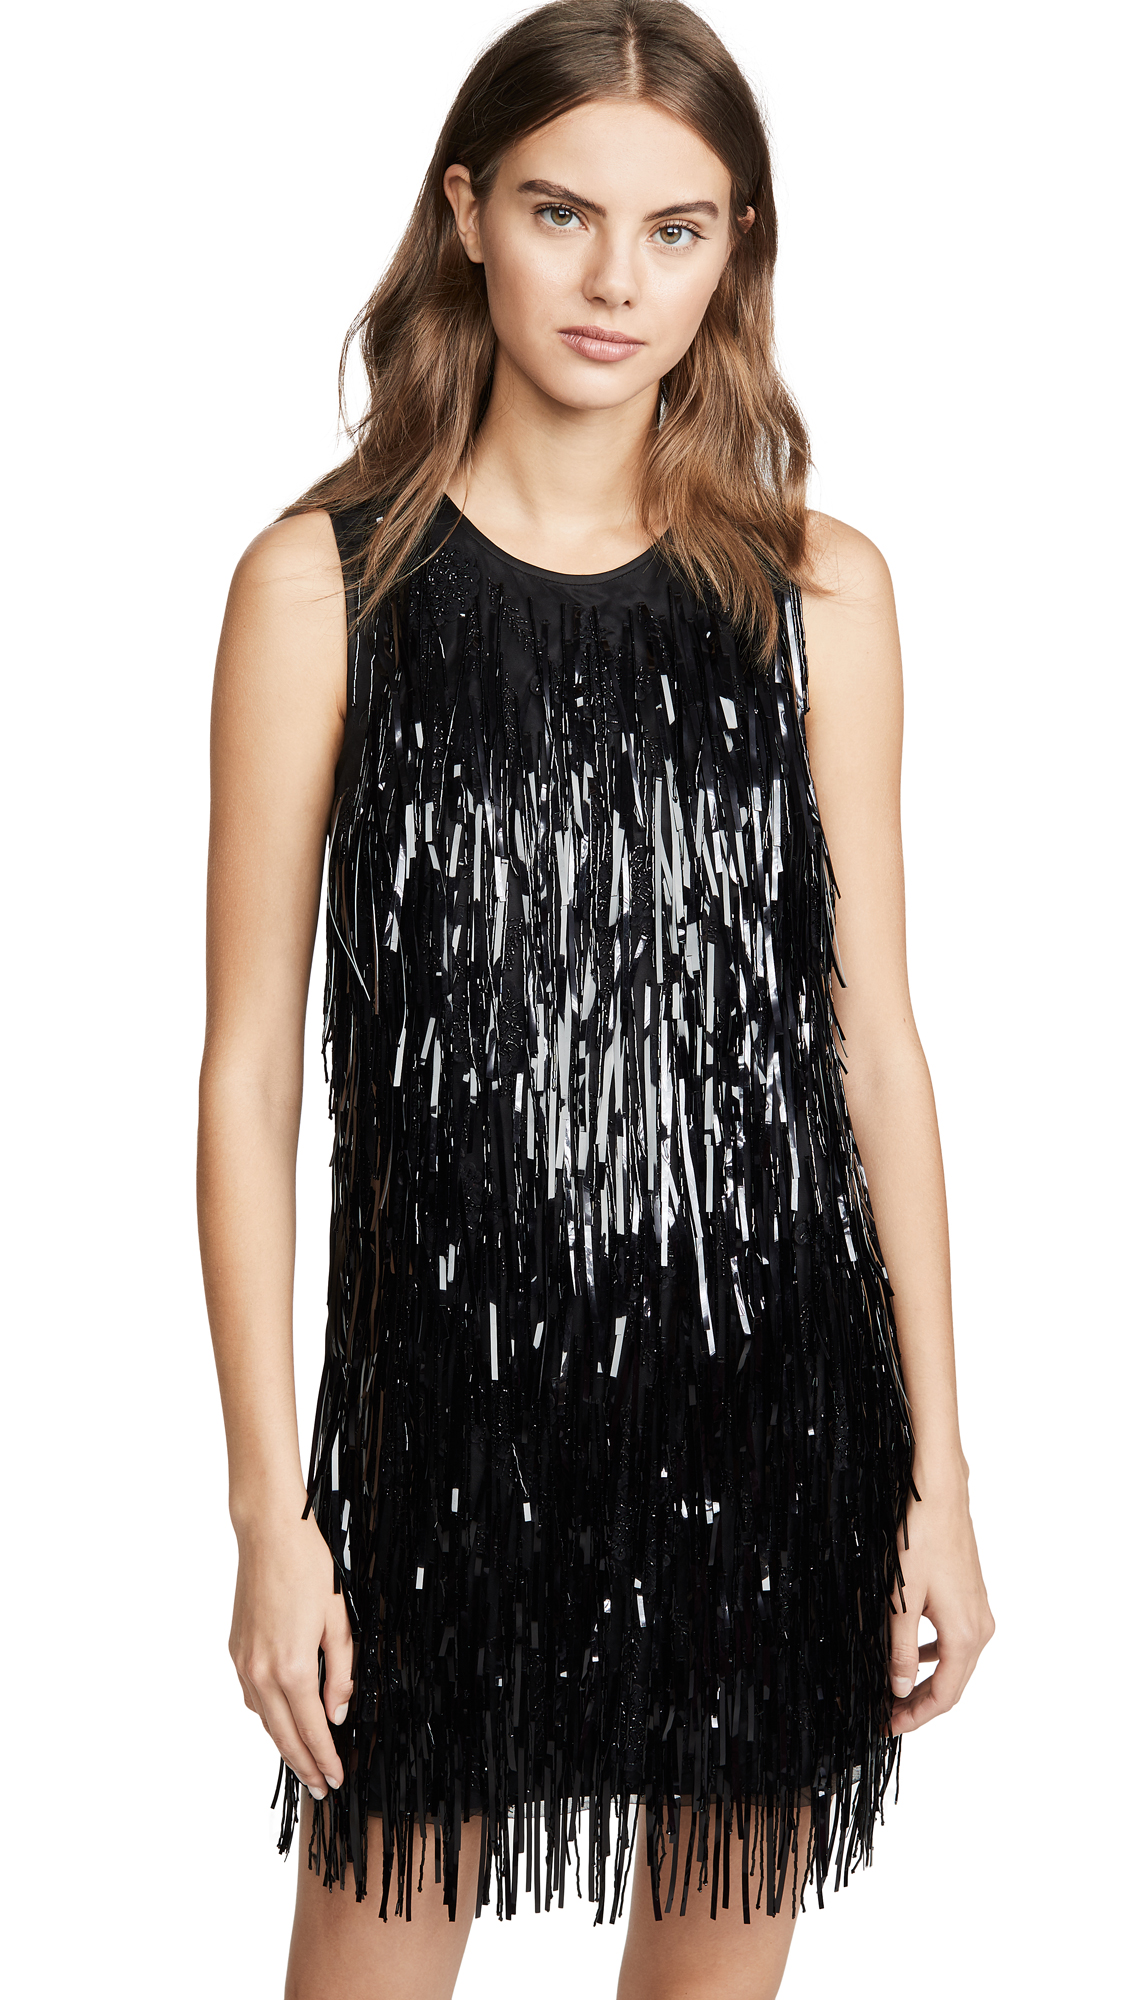 Buy No. 21 Sleeveless Mini Dress online beautiful No. 21 Clothing, Dresses